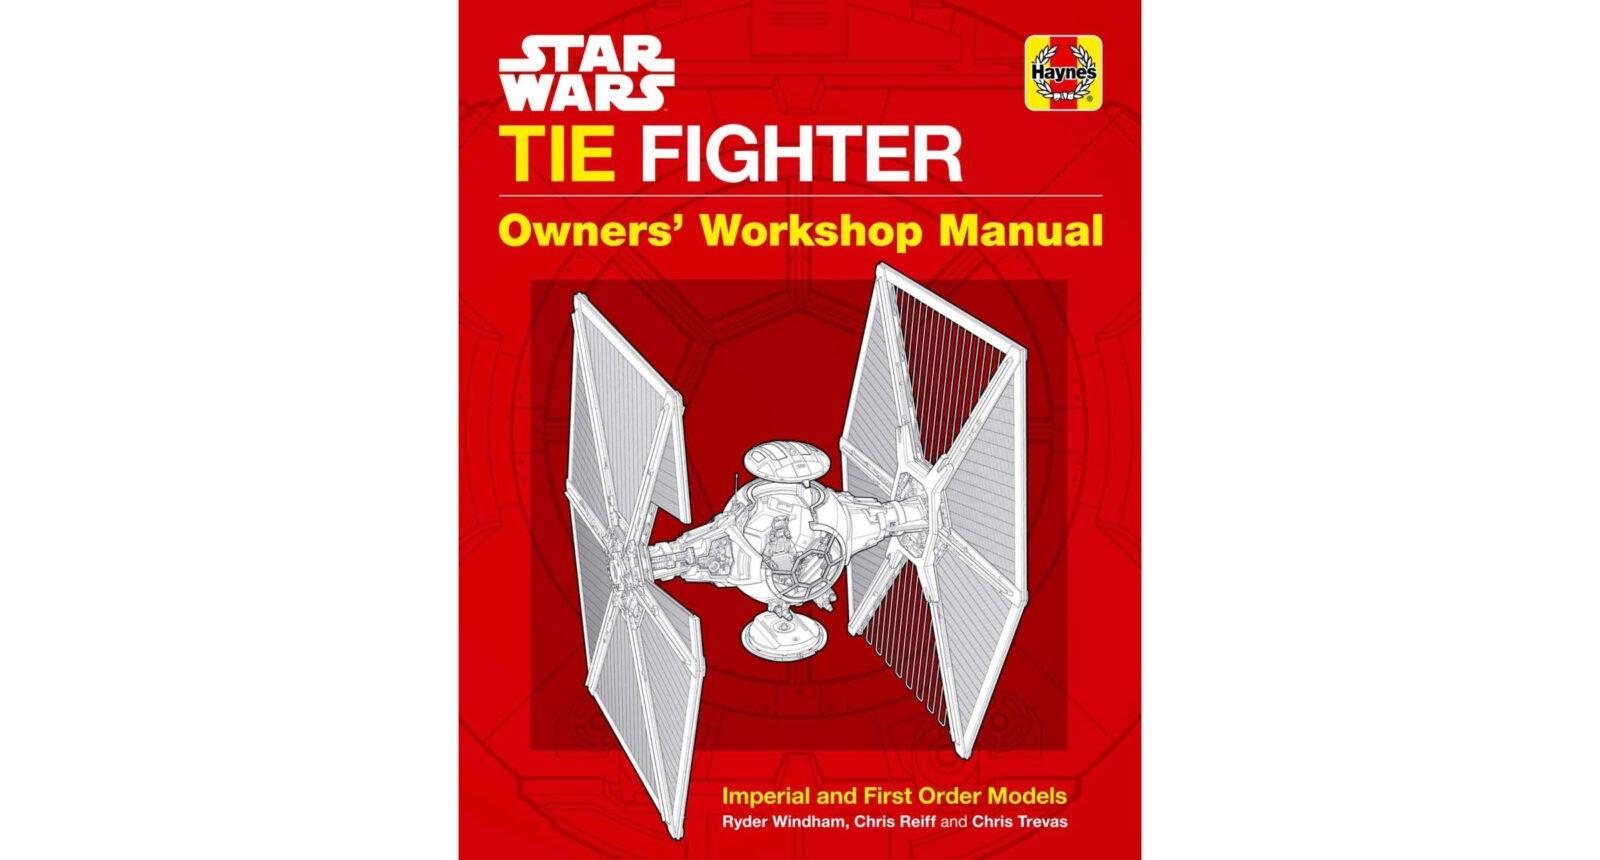 Tie Fighter Owner's Workshop Manual